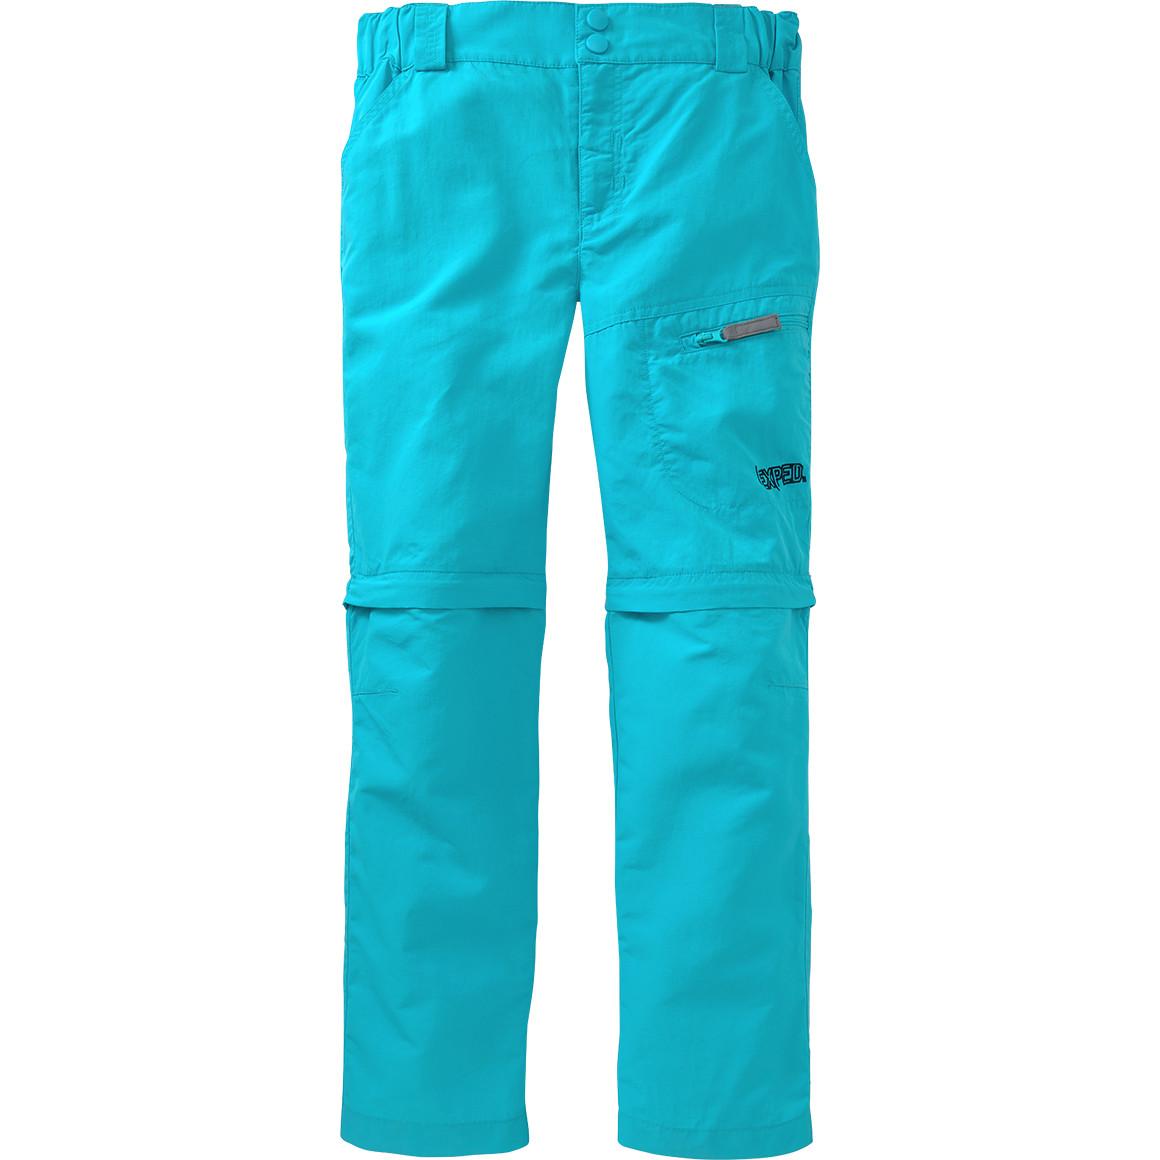 Jungen Trekking Hose mit Zipp Off Funktion